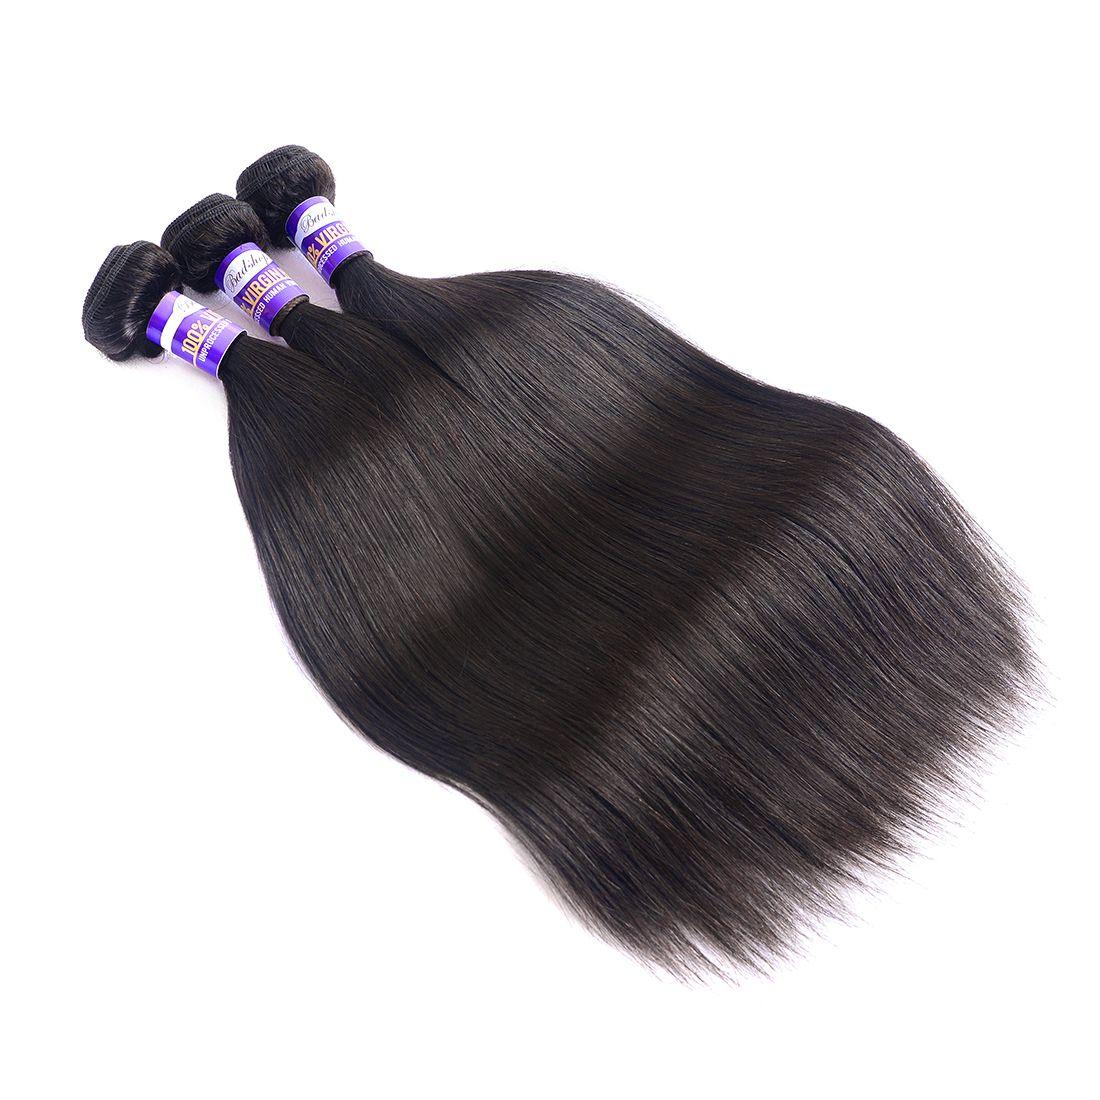 9A brasilianischen Glattes Haar Weave 3 Bundles brasilianische gerade reine Menschenhaar-Verlängerungen Unverarbeitete Jungfrau-brasilianische Haar-Webart Bundles